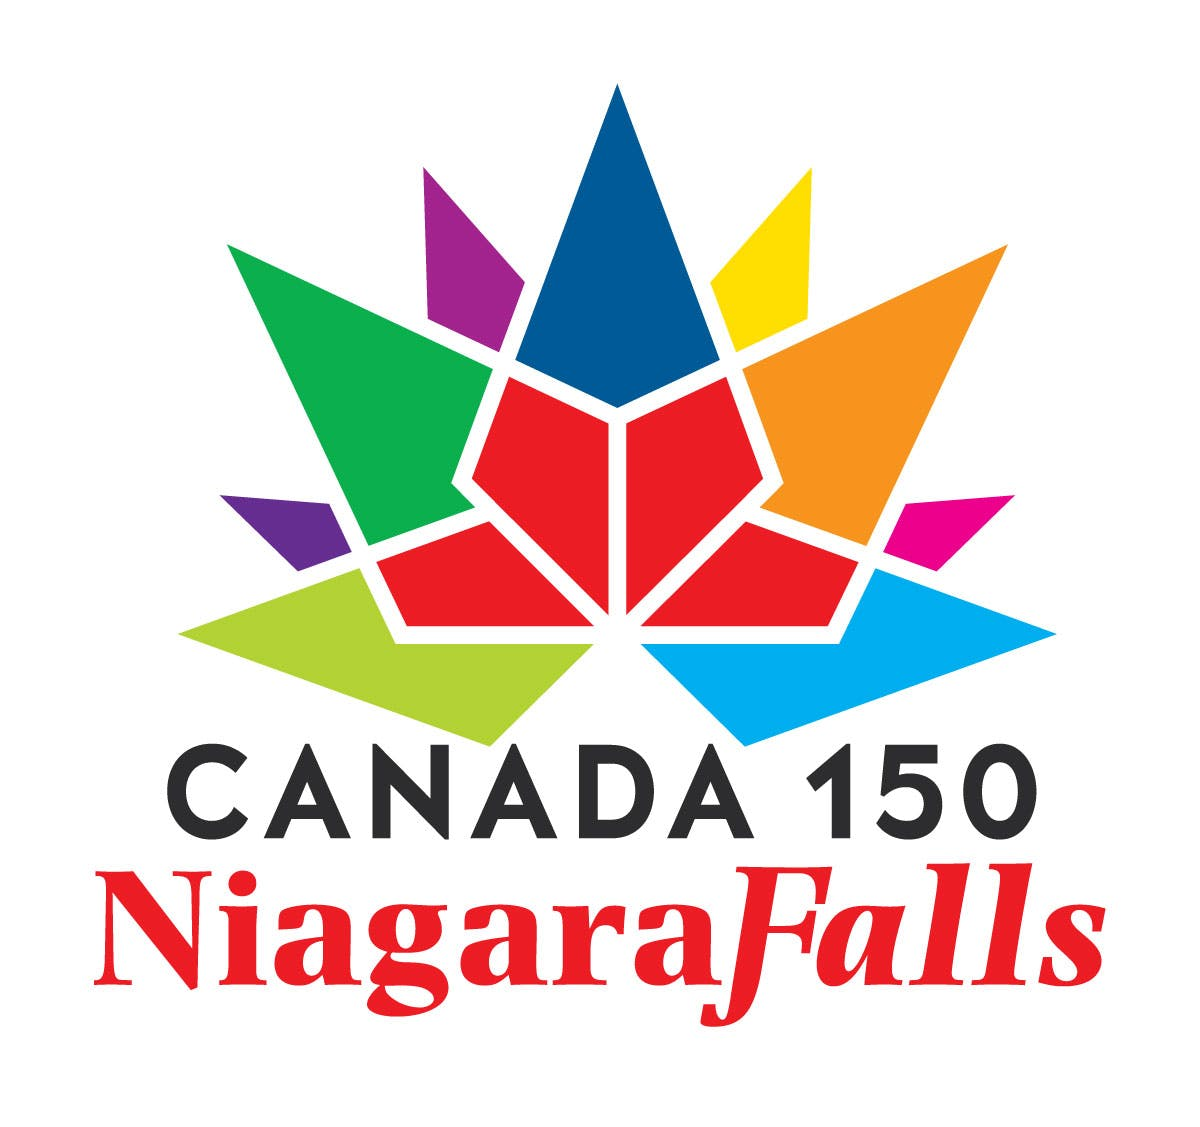 Canada 150 Niagara Falls